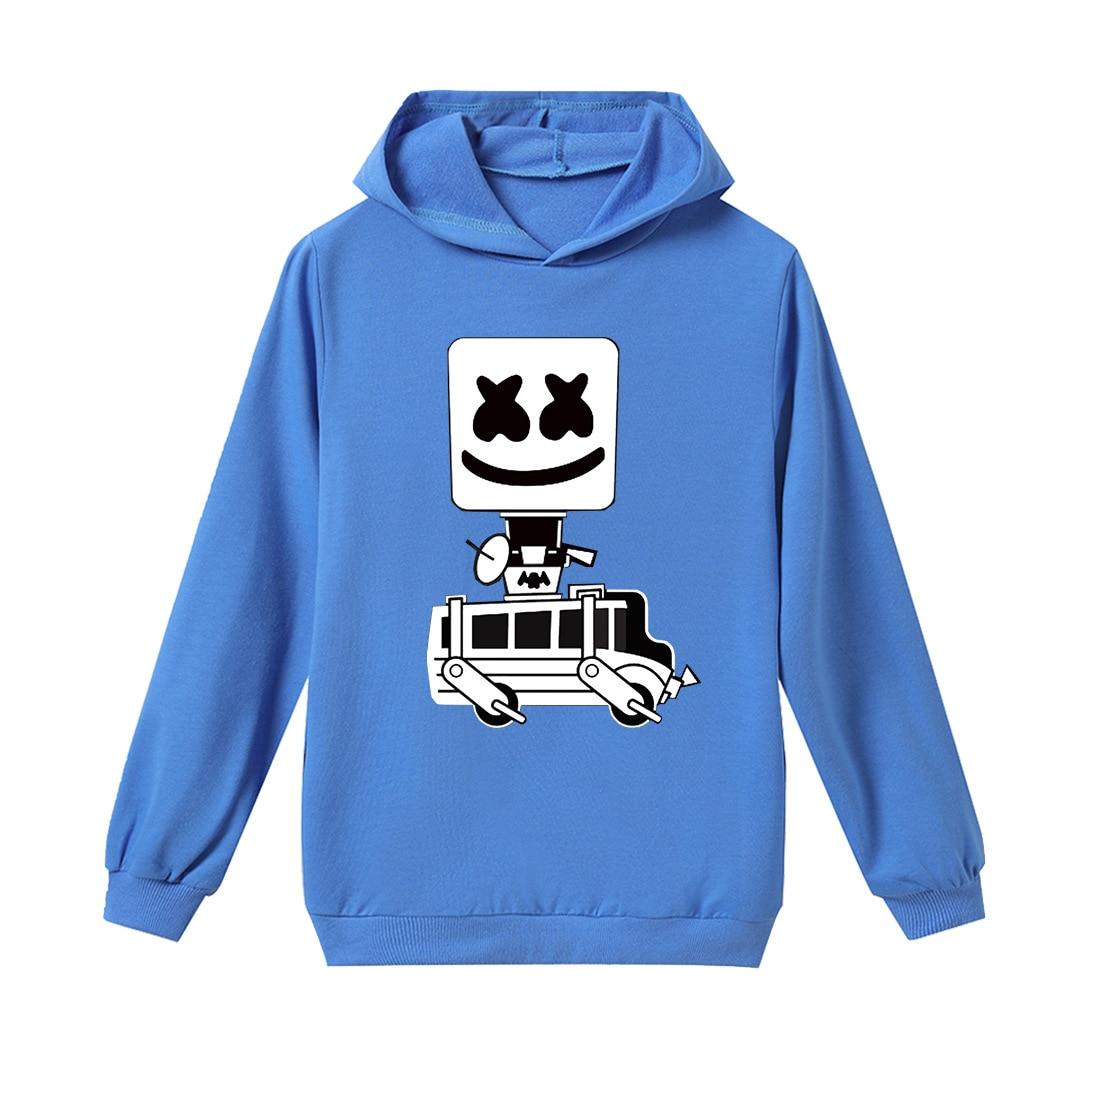 Childrens Tank Silhouette Sweater Baby Boys Sweatshirt